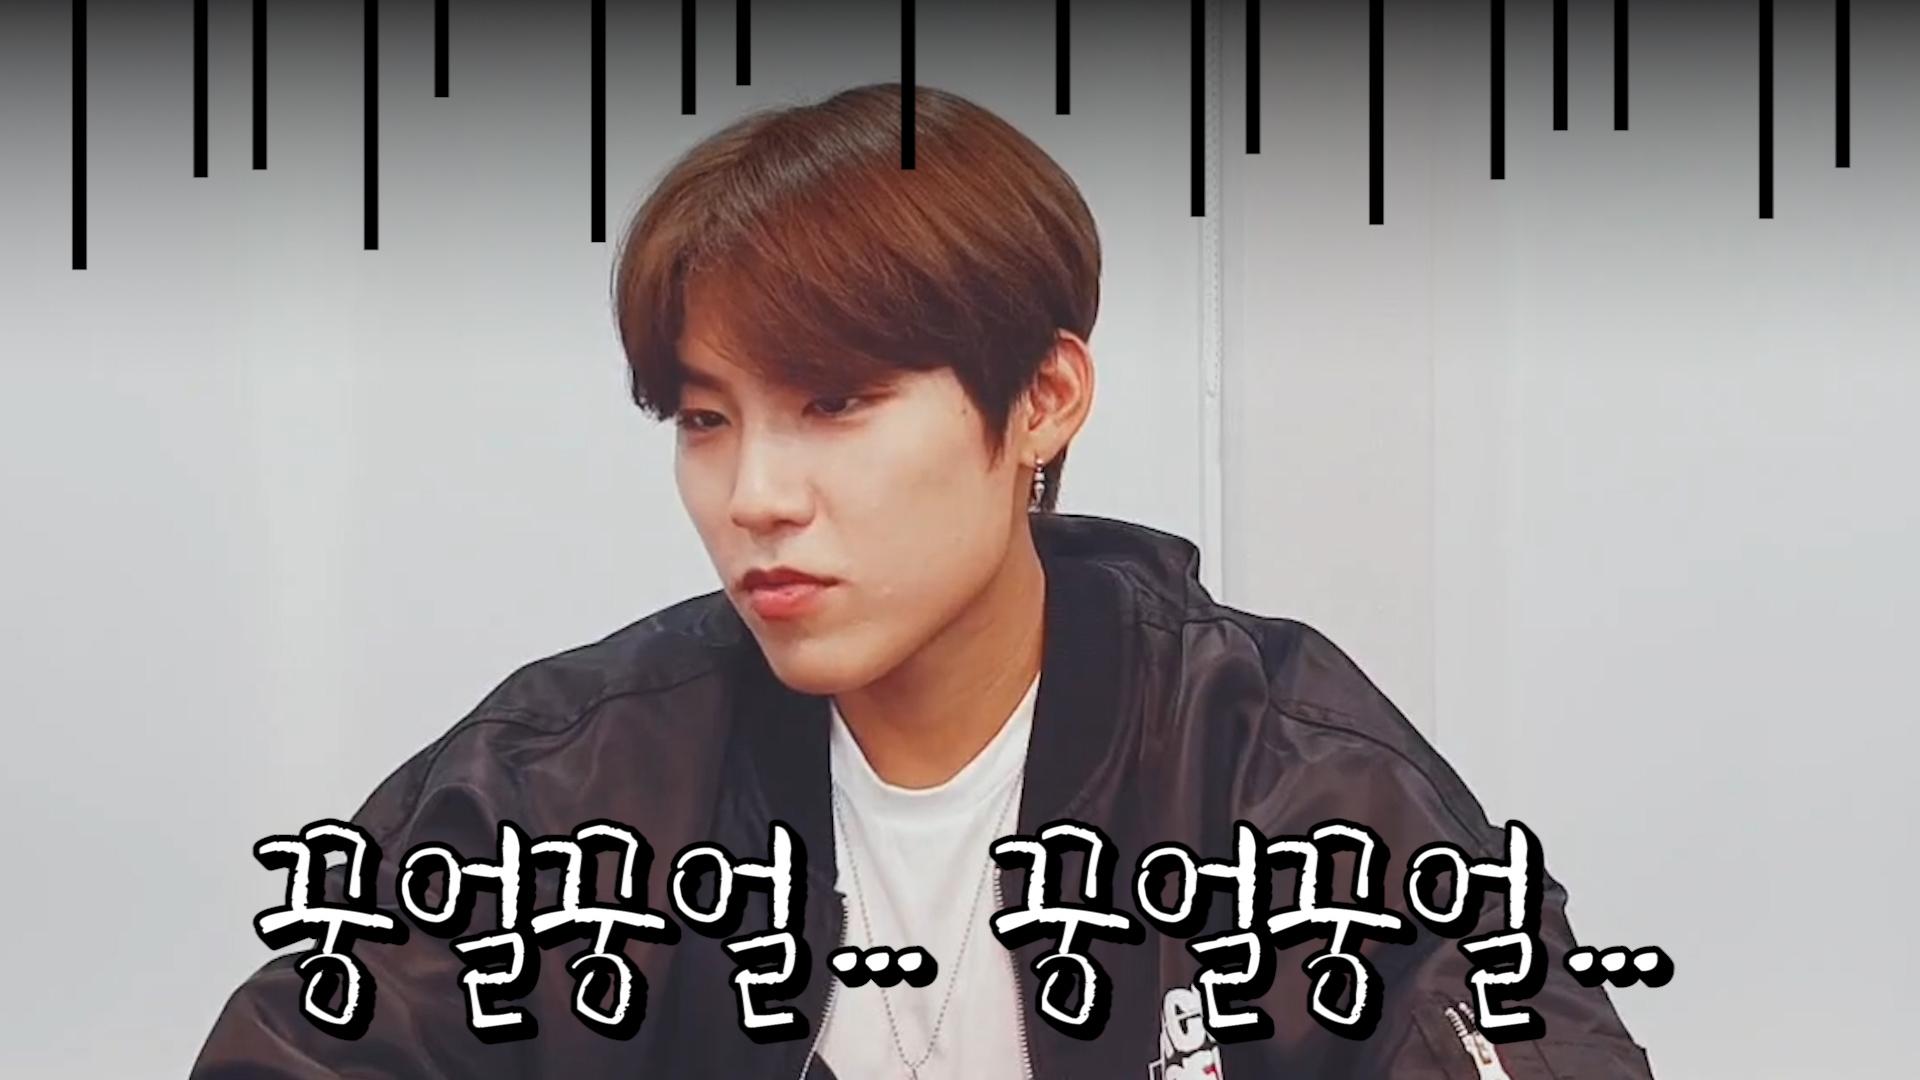 [AB6IX] 바구쯔 또 귀엽다.. (👤: 아 님 스포 자제요;;) (WOOJIN talking about Movie&Drama)